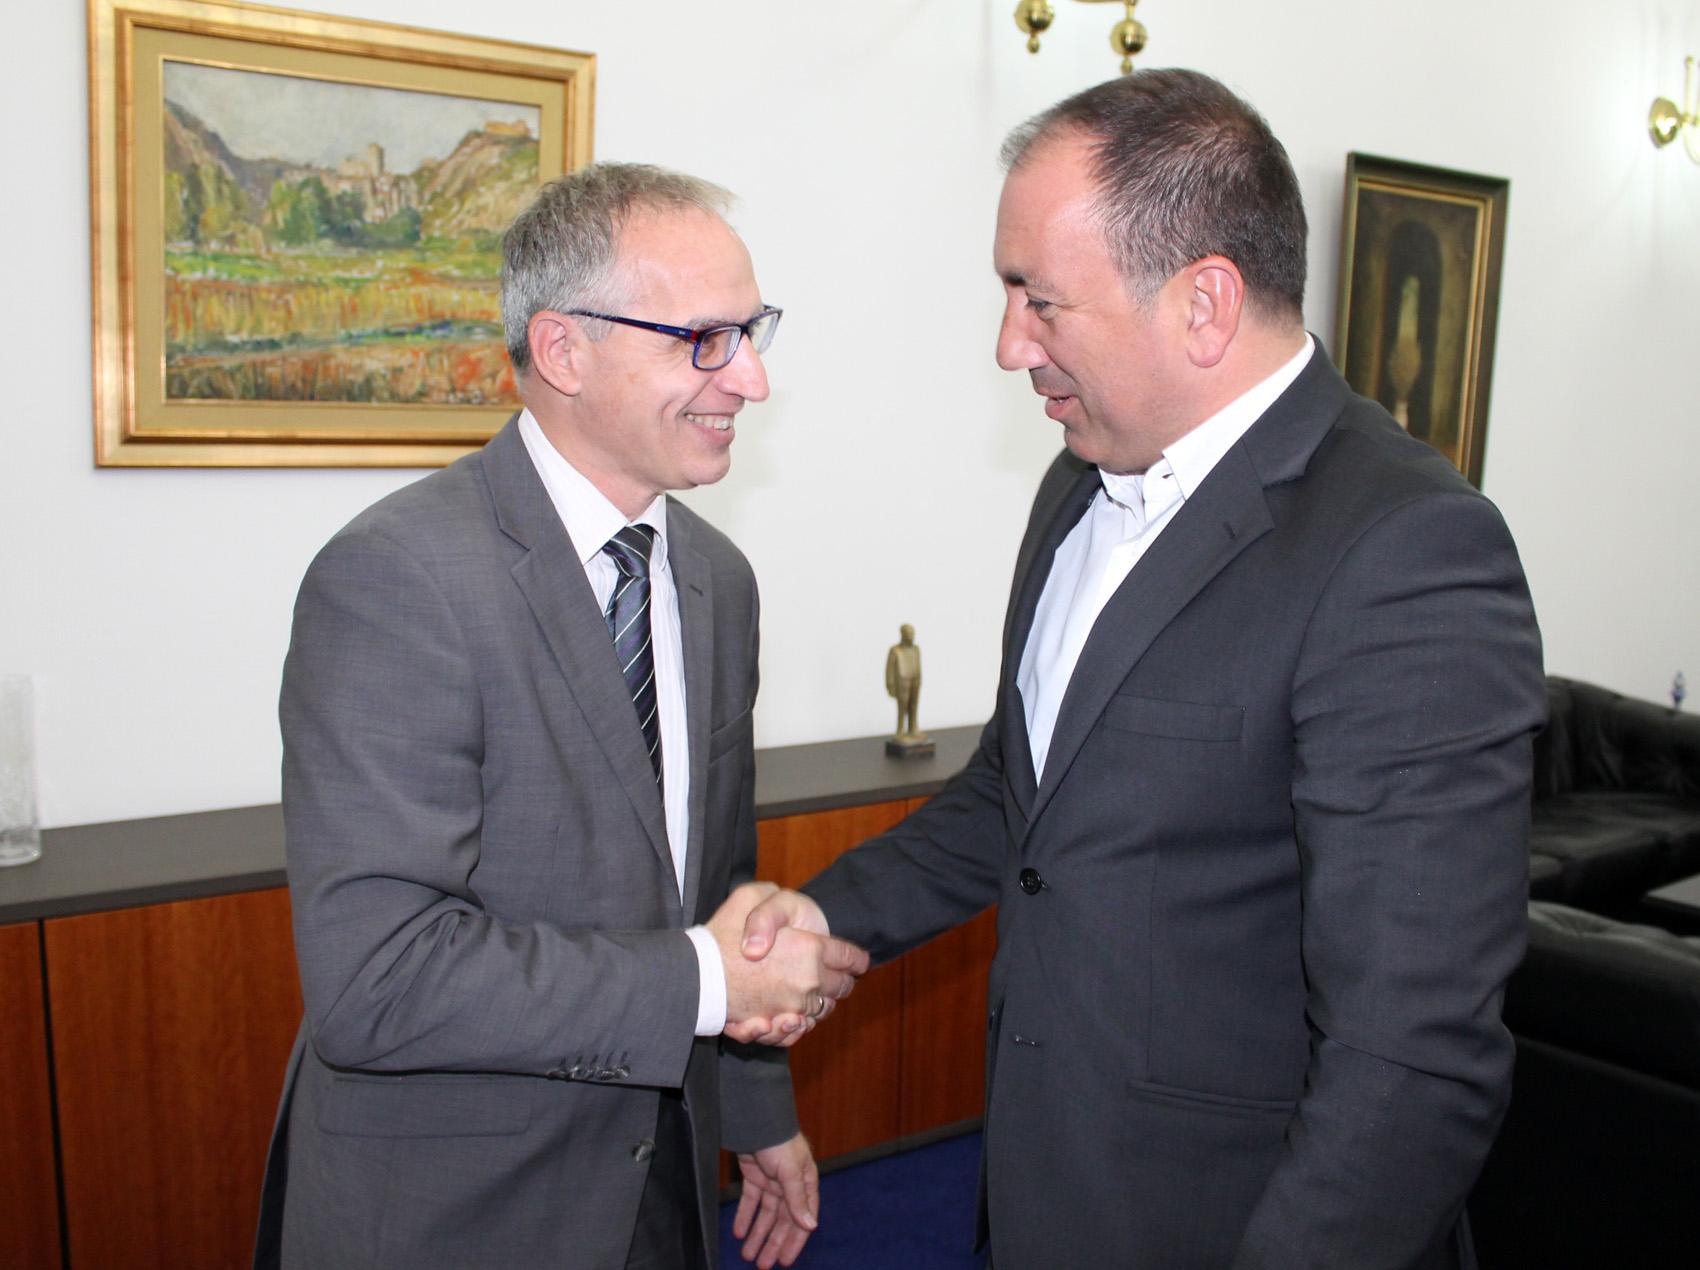 RCC Secretary General, Goran Svilanovic at his first official visit to the Minister of Foreign Affairs of BiH, Igor Crnadak (Photo: MFA of Bosnia and Herzegovina/Jasmin Gagula)